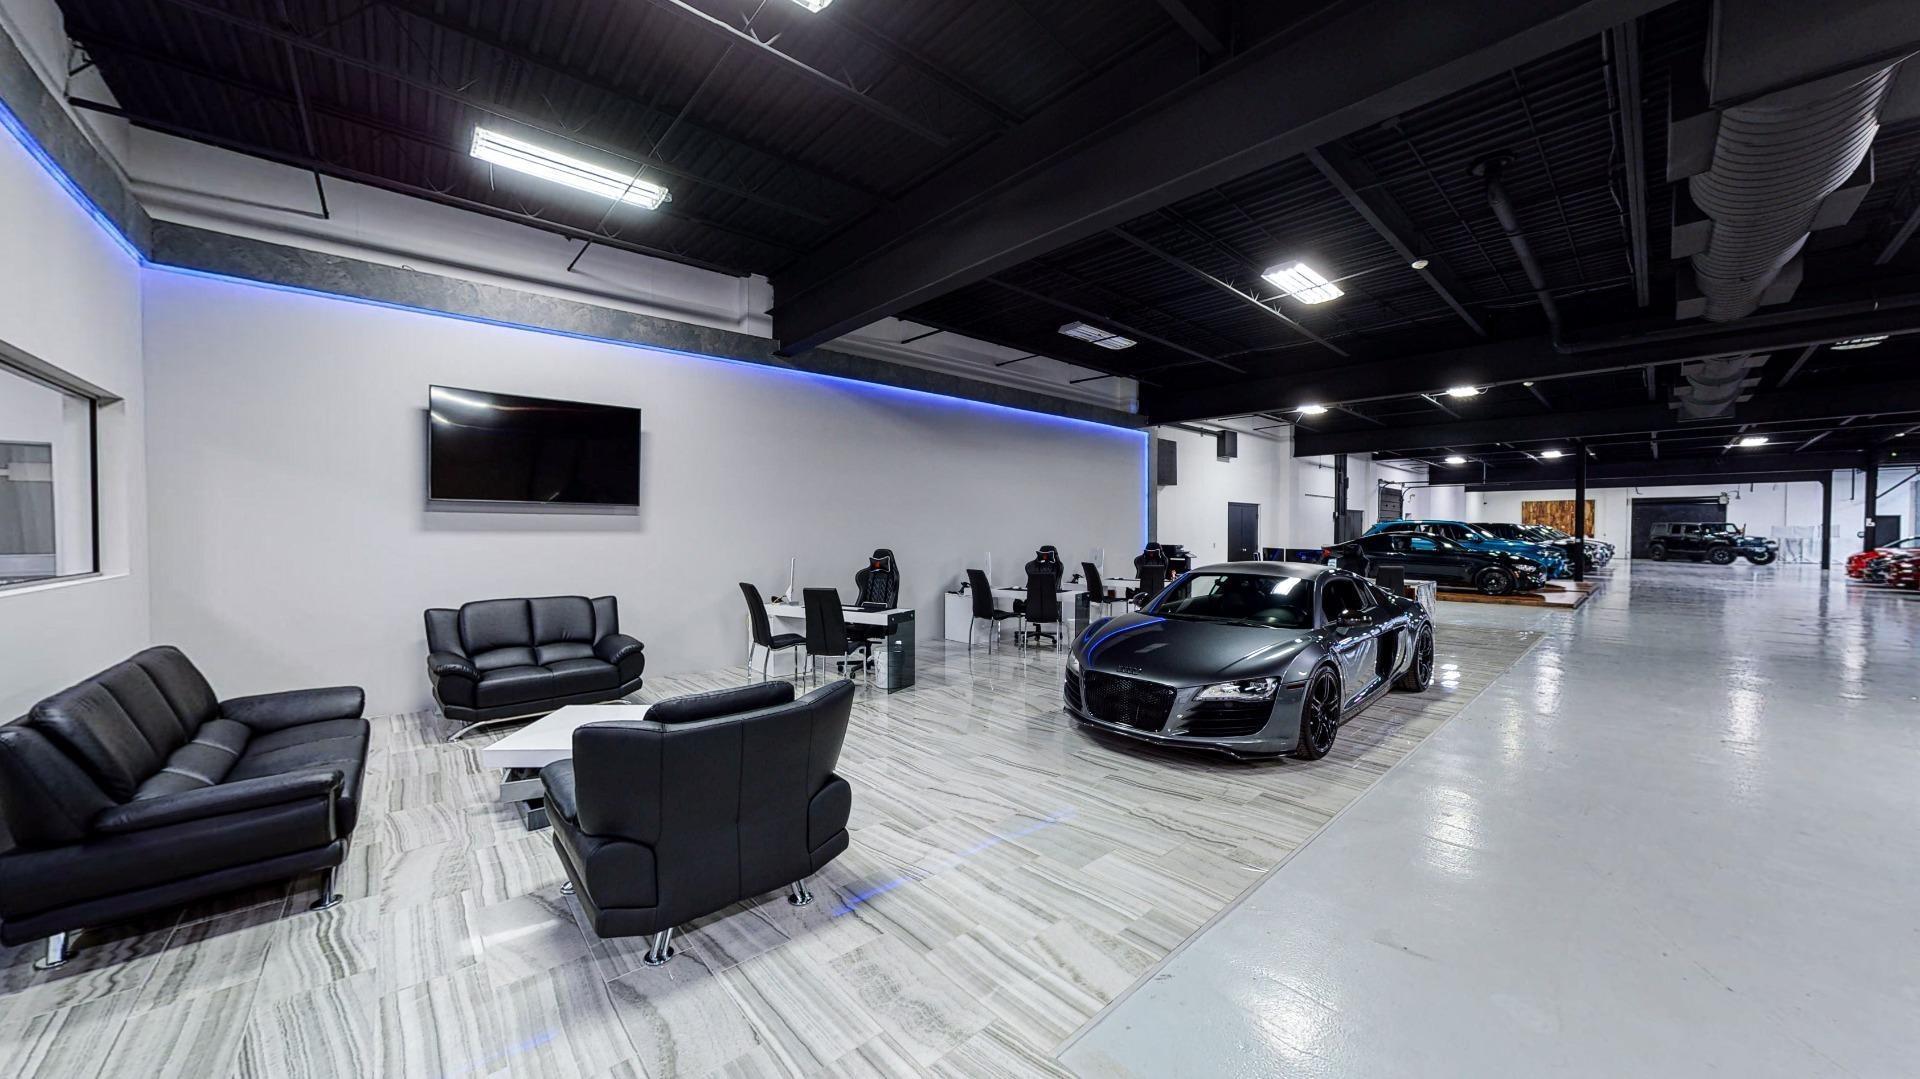 Used 2010 Maserati GranTurismo for sale $38,495 at Perfect Auto Collection in Akron OH 44310 3